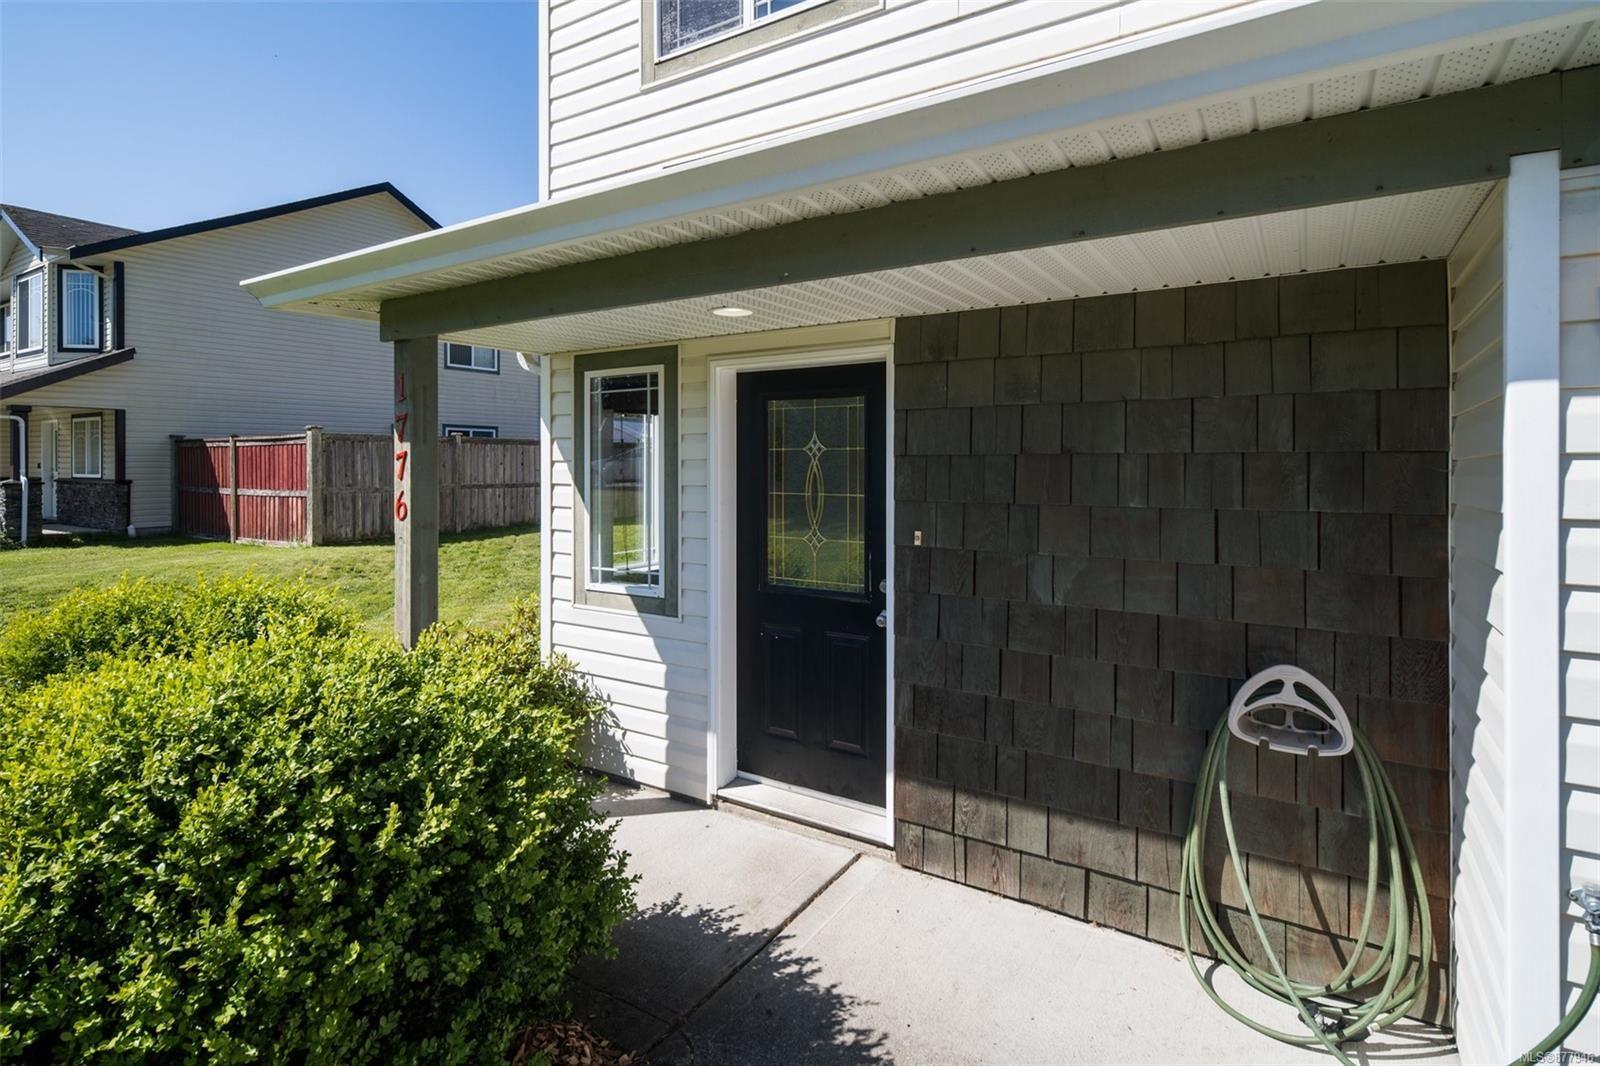 Photo 4: Photos: 1776 Marathon Lane in : Sk Whiffin Spit House for sale (Sooke)  : MLS®# 877946